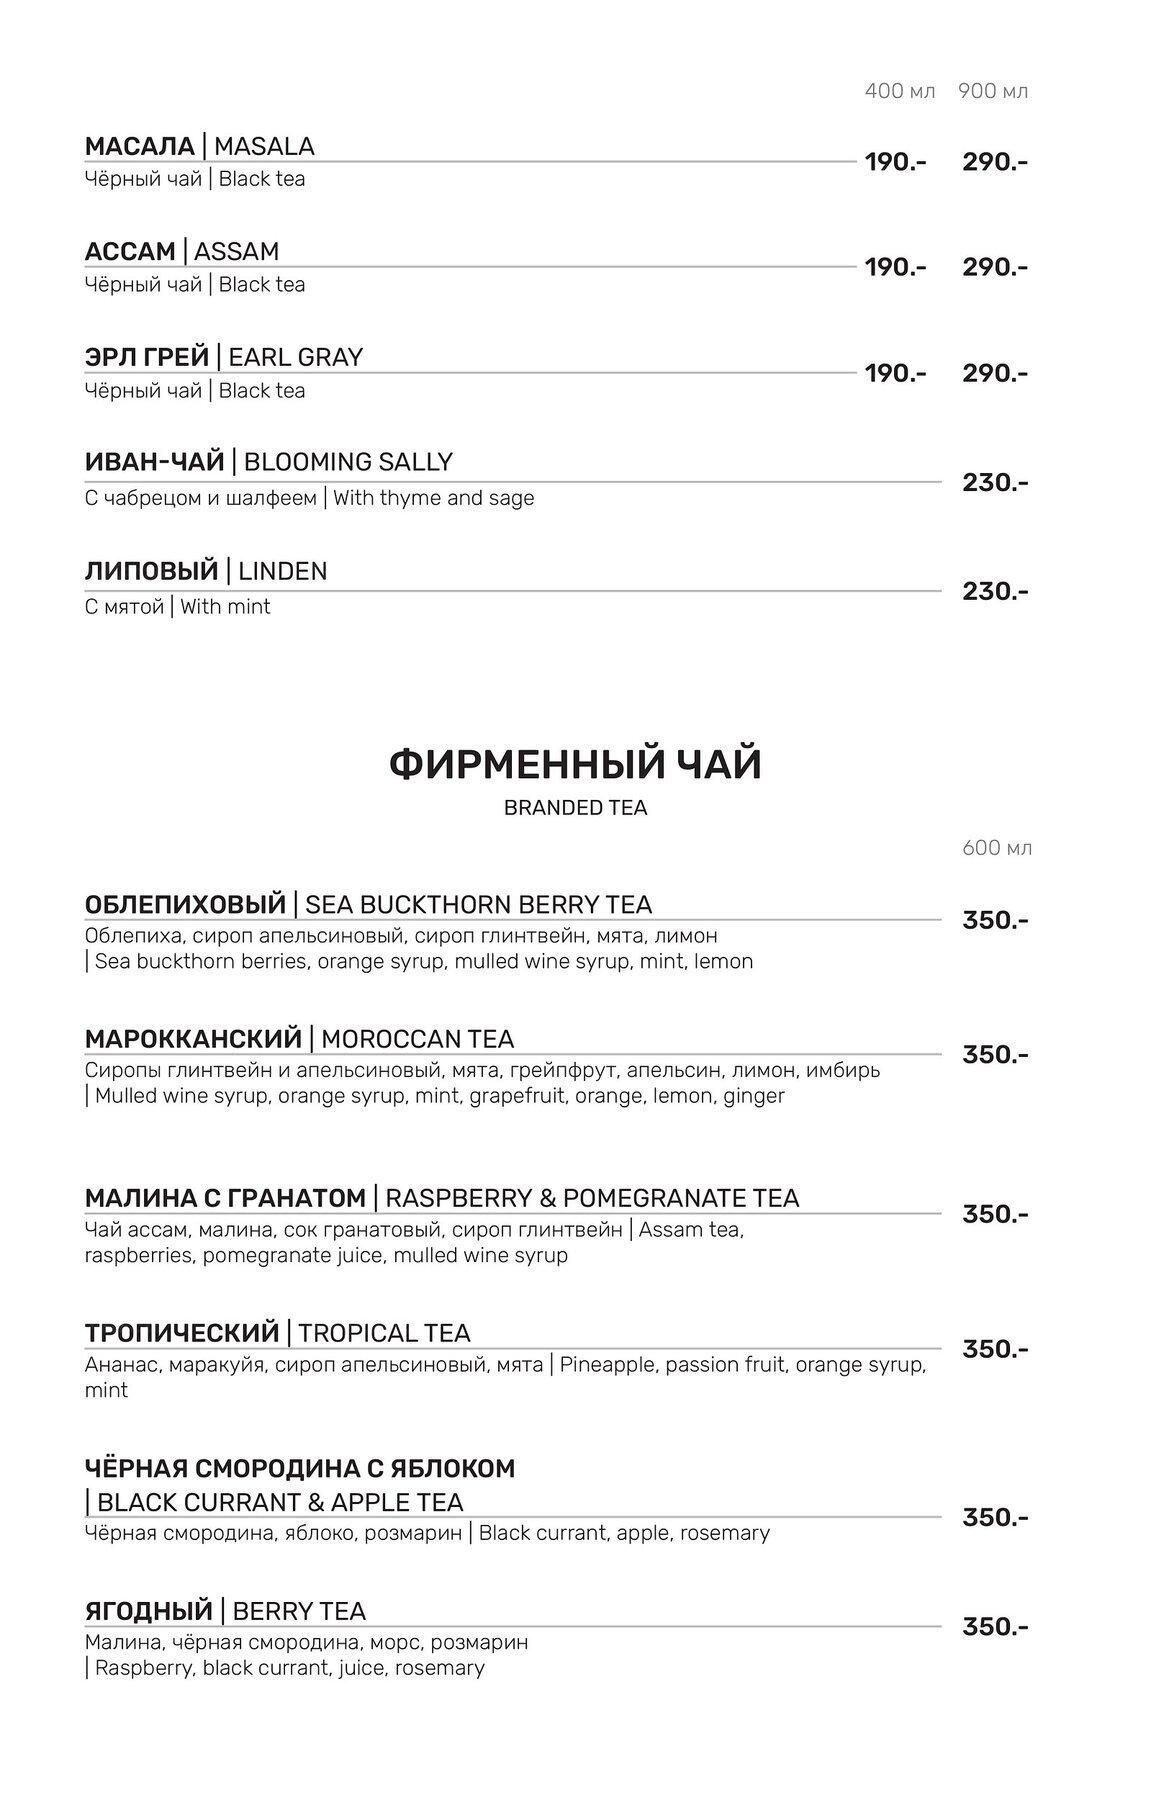 Меню ресторана Абажур на Гагарина фото 22